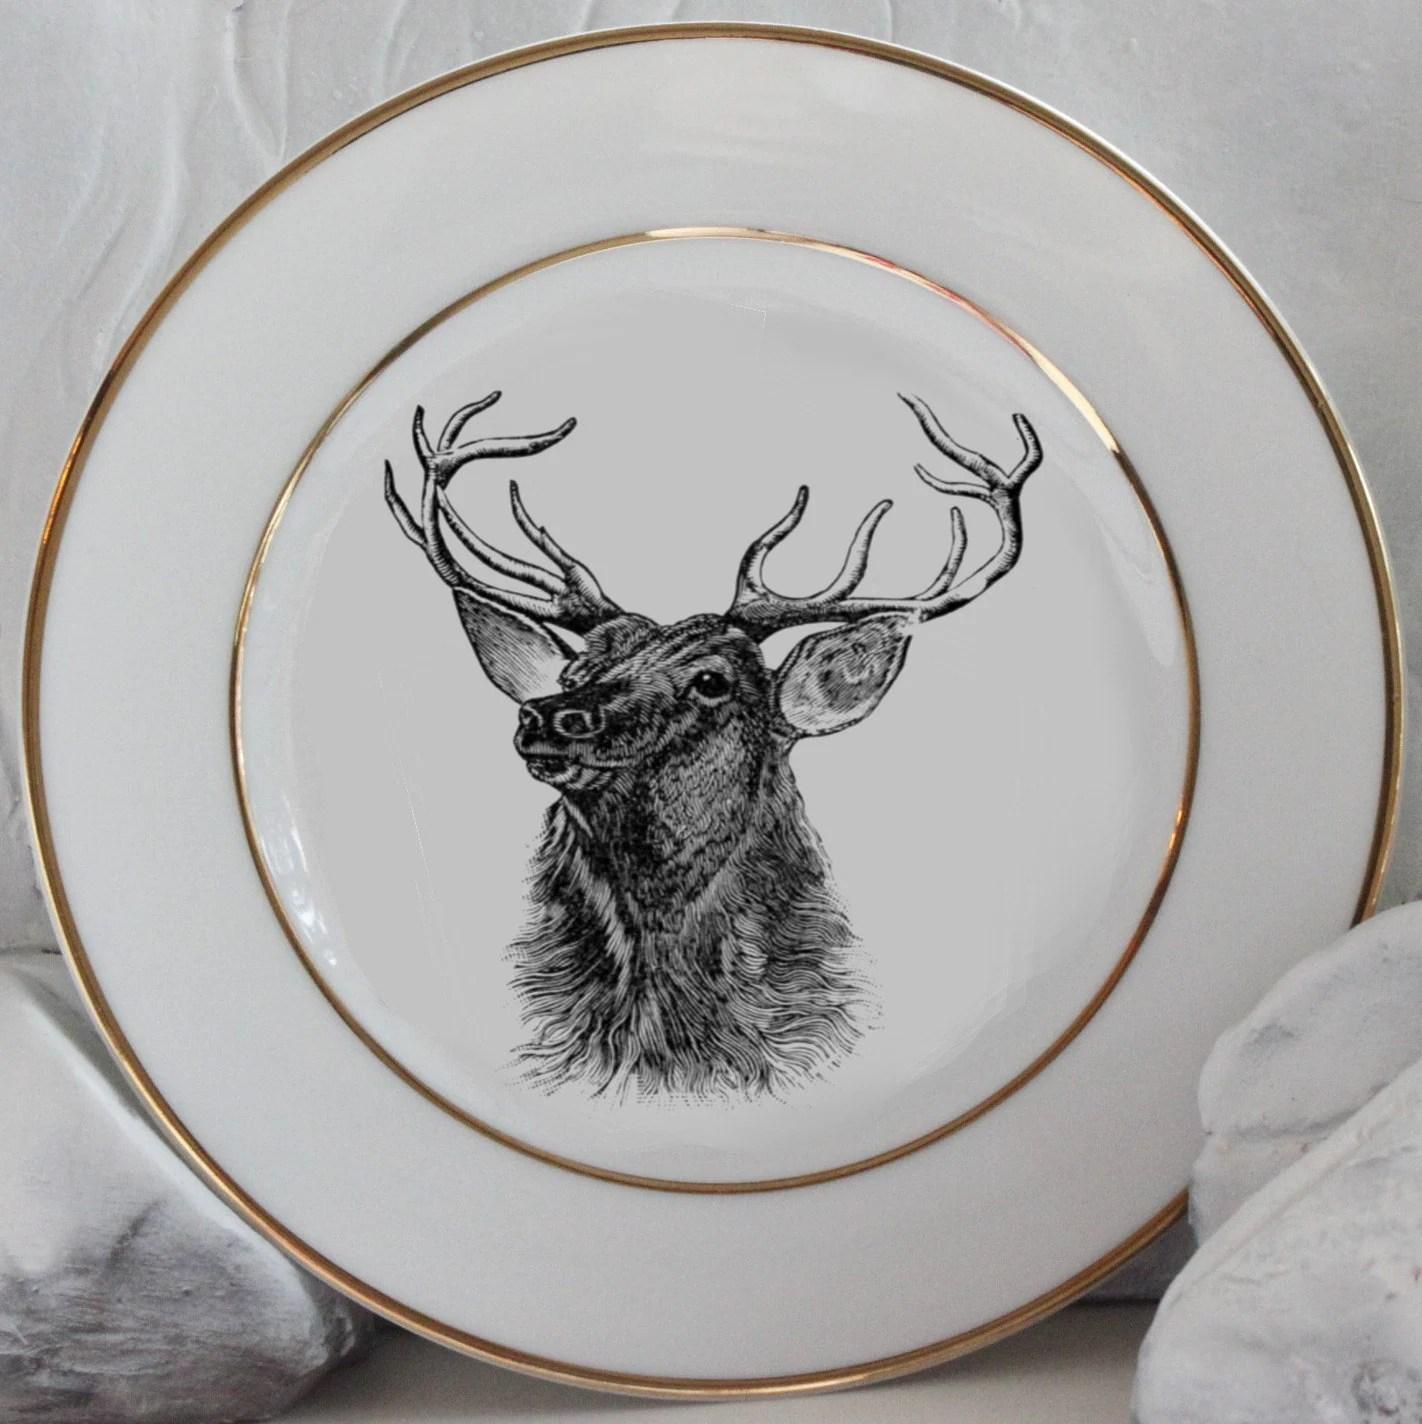 Gold Deer / Reindeer Plates, Dinnerware, Dishes, Customized